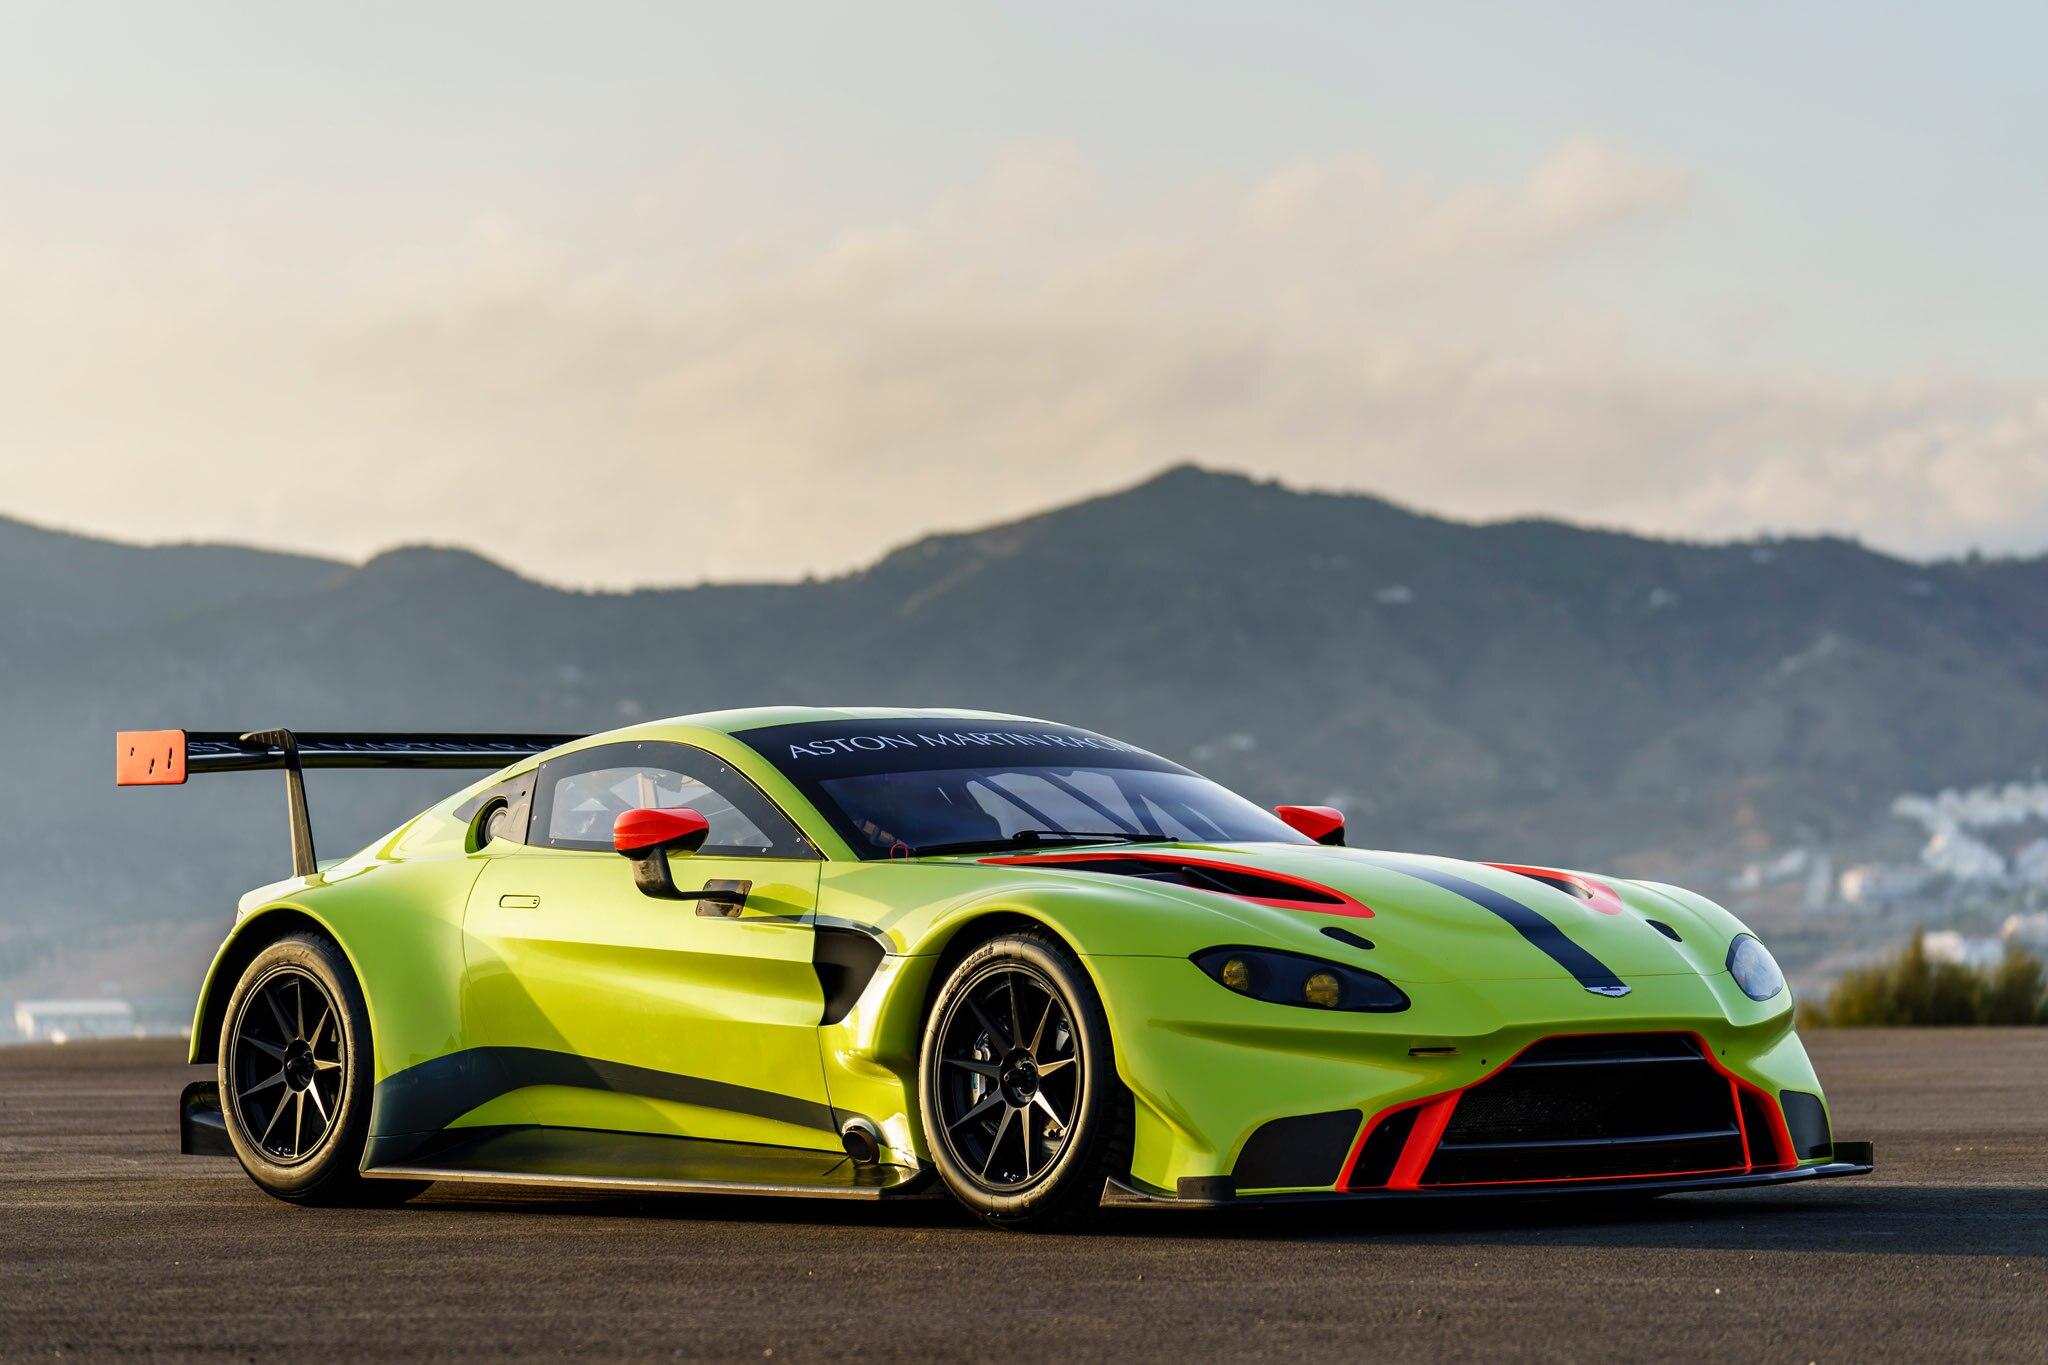 Aston Martin Racing_2018 Vantage GTE_01